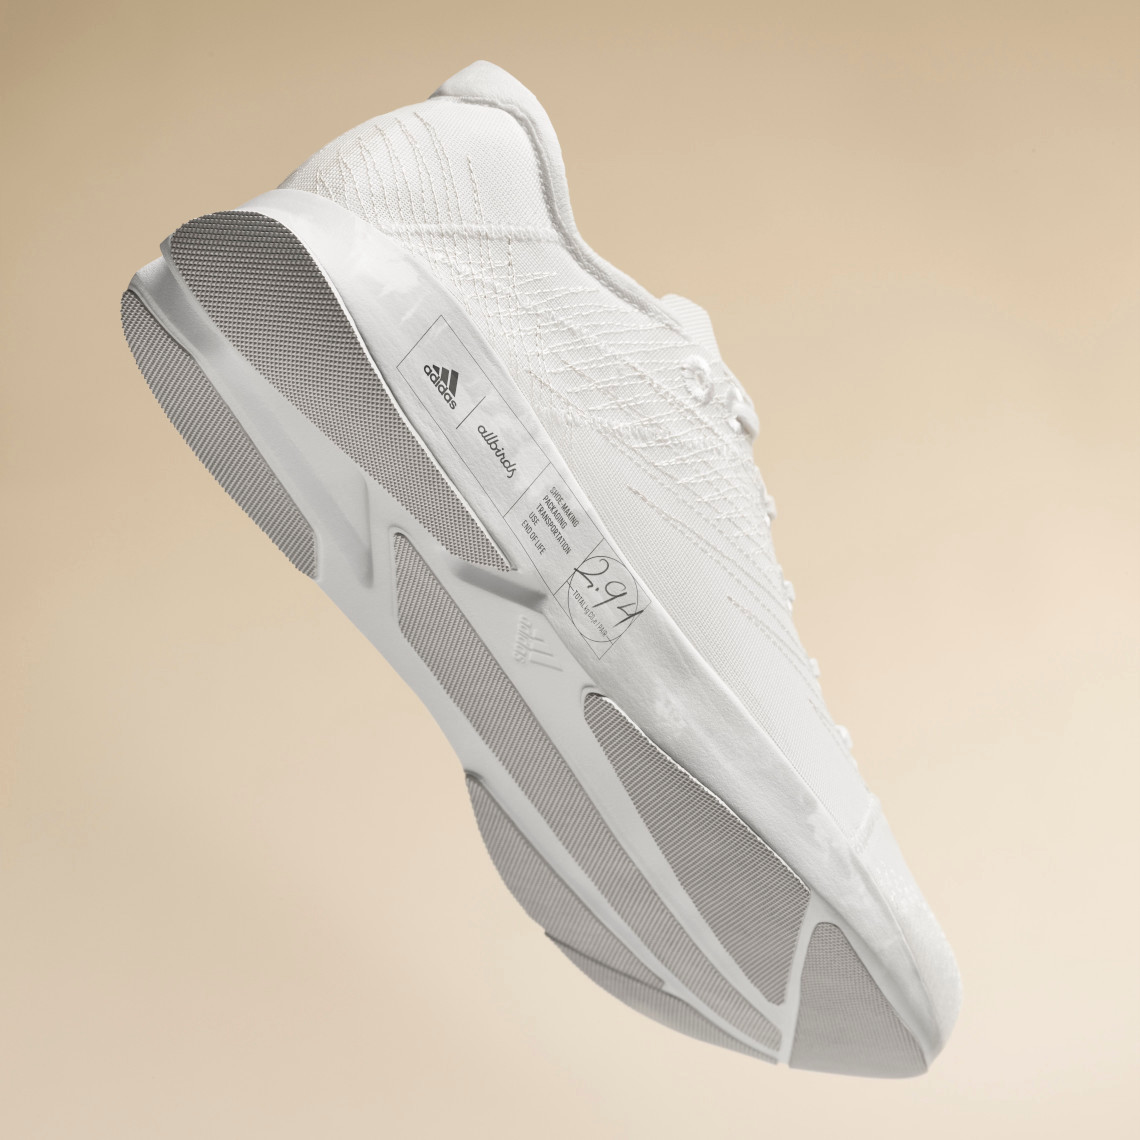 Adidas Allbirds Futurecraft Footprint